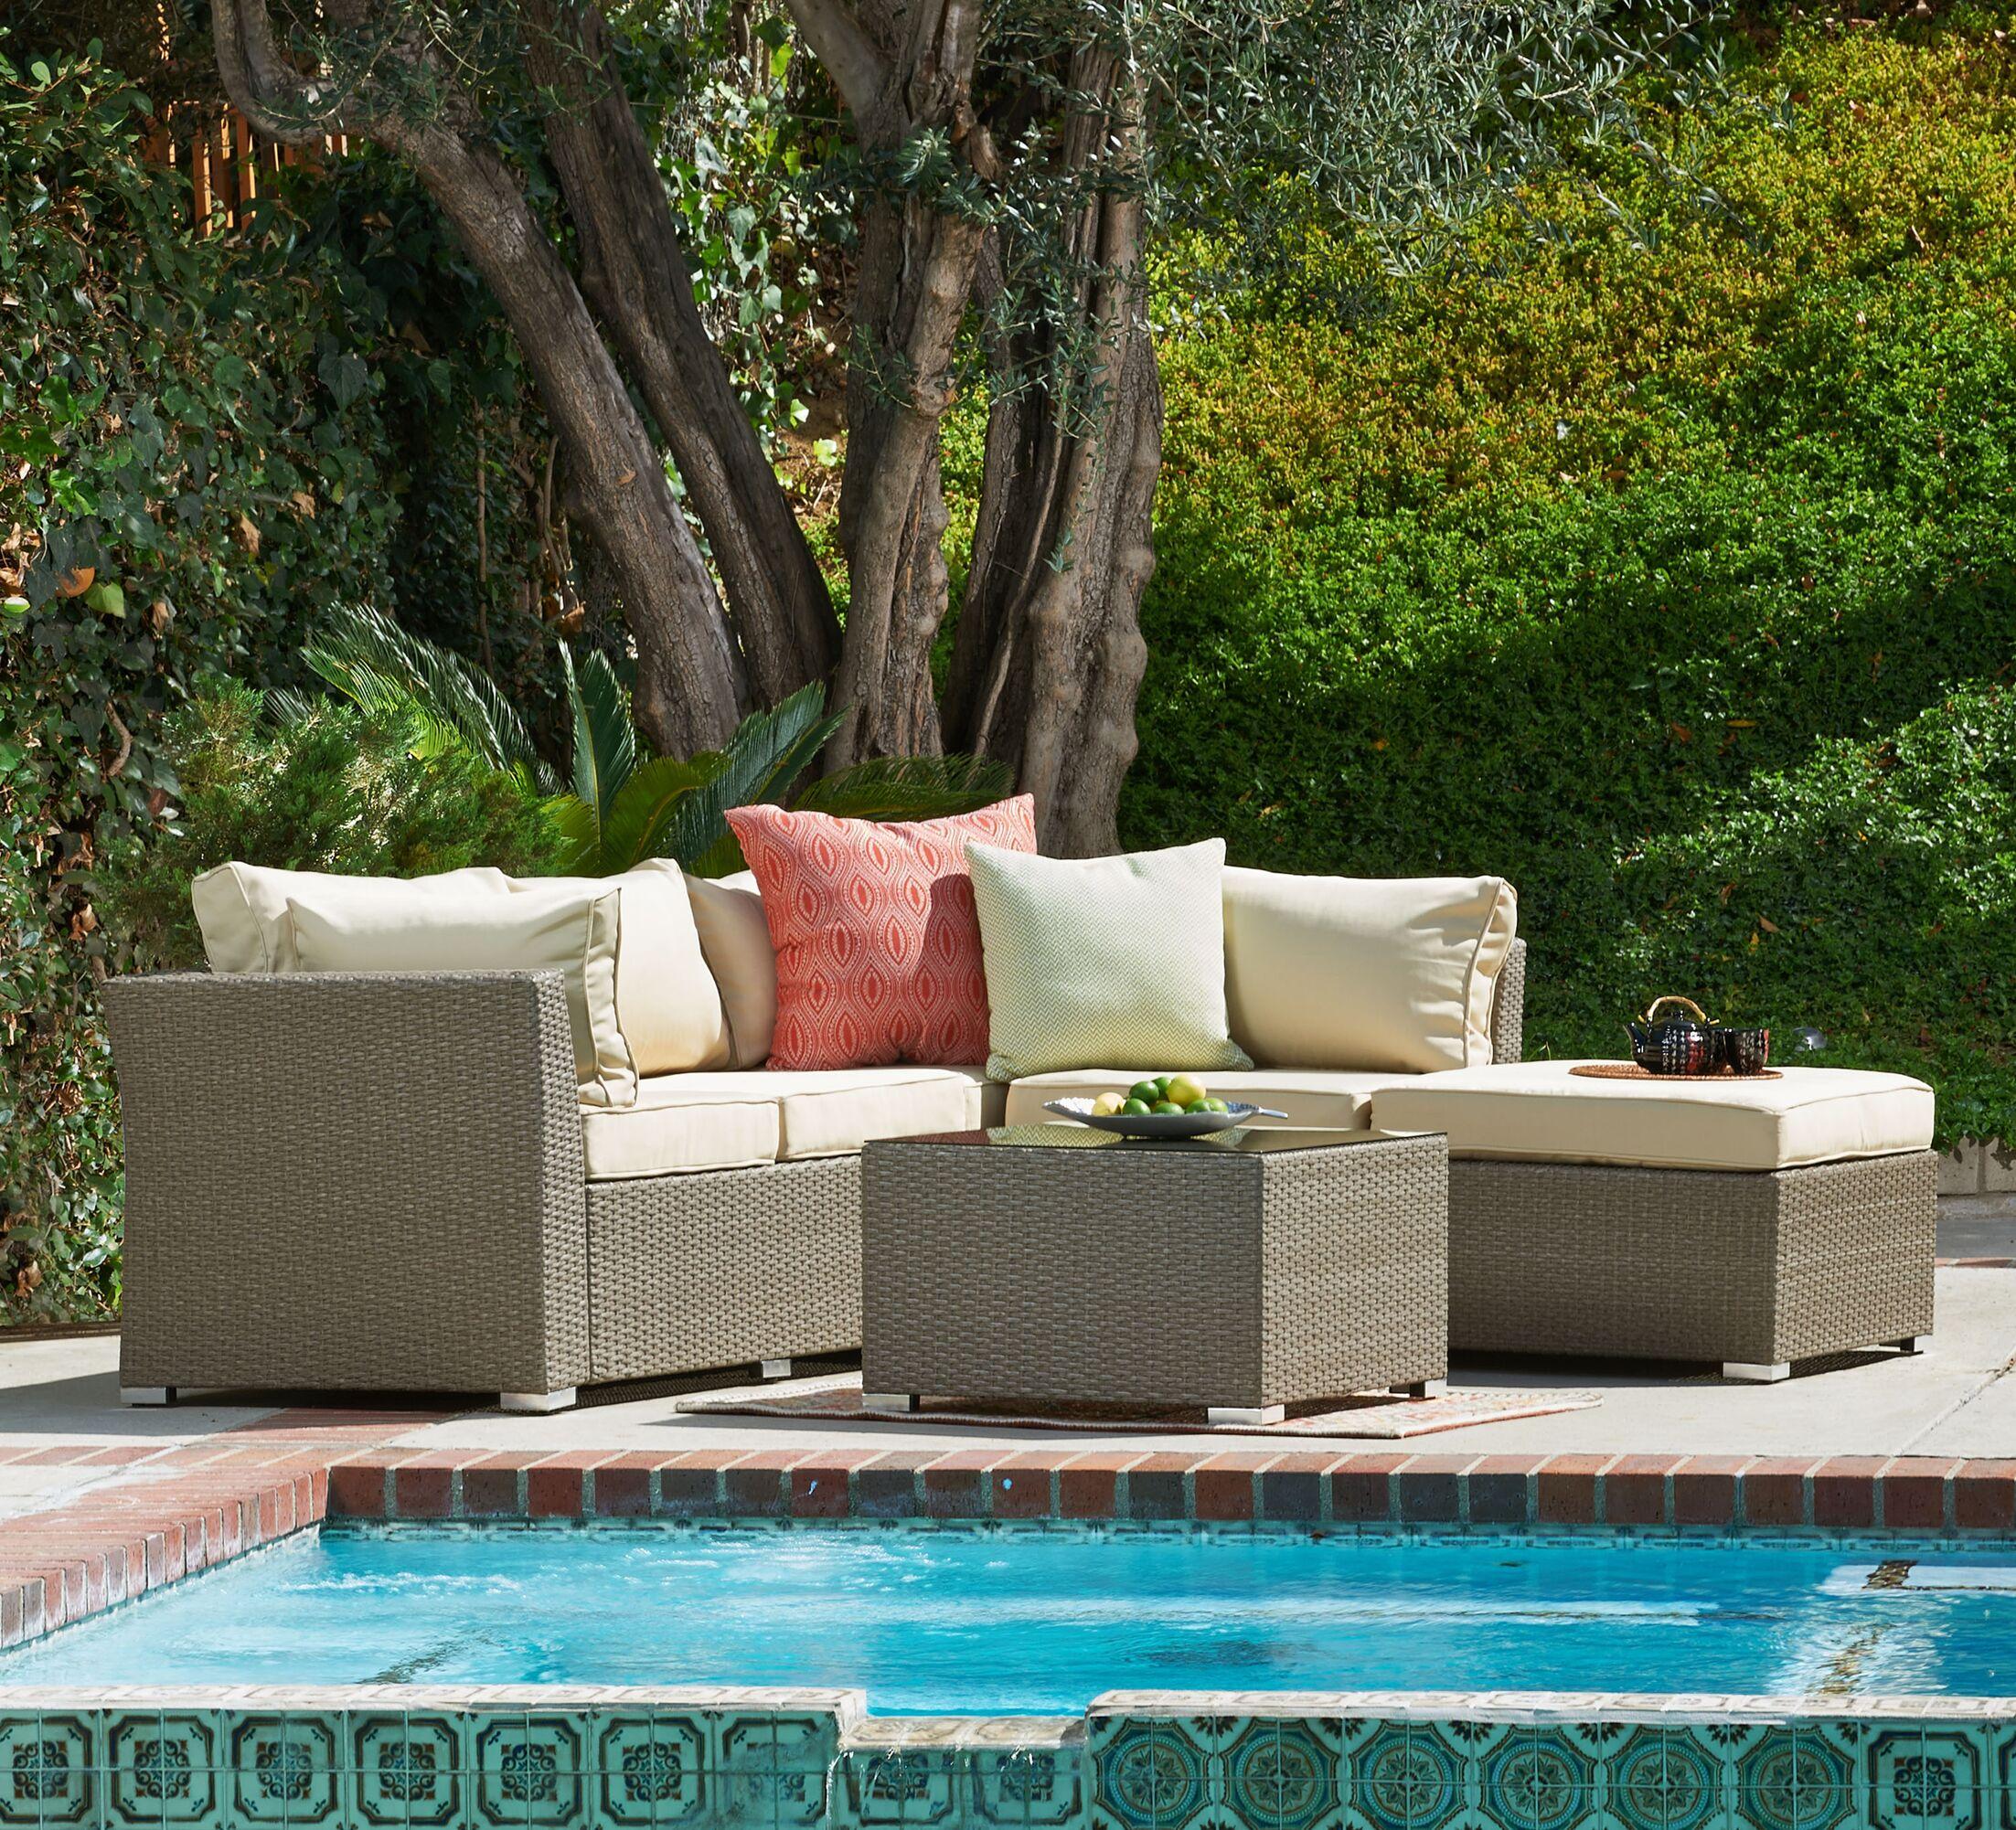 5 Piece Sectional Set Cushion Color: Beige, Frame Color: Dark Brown